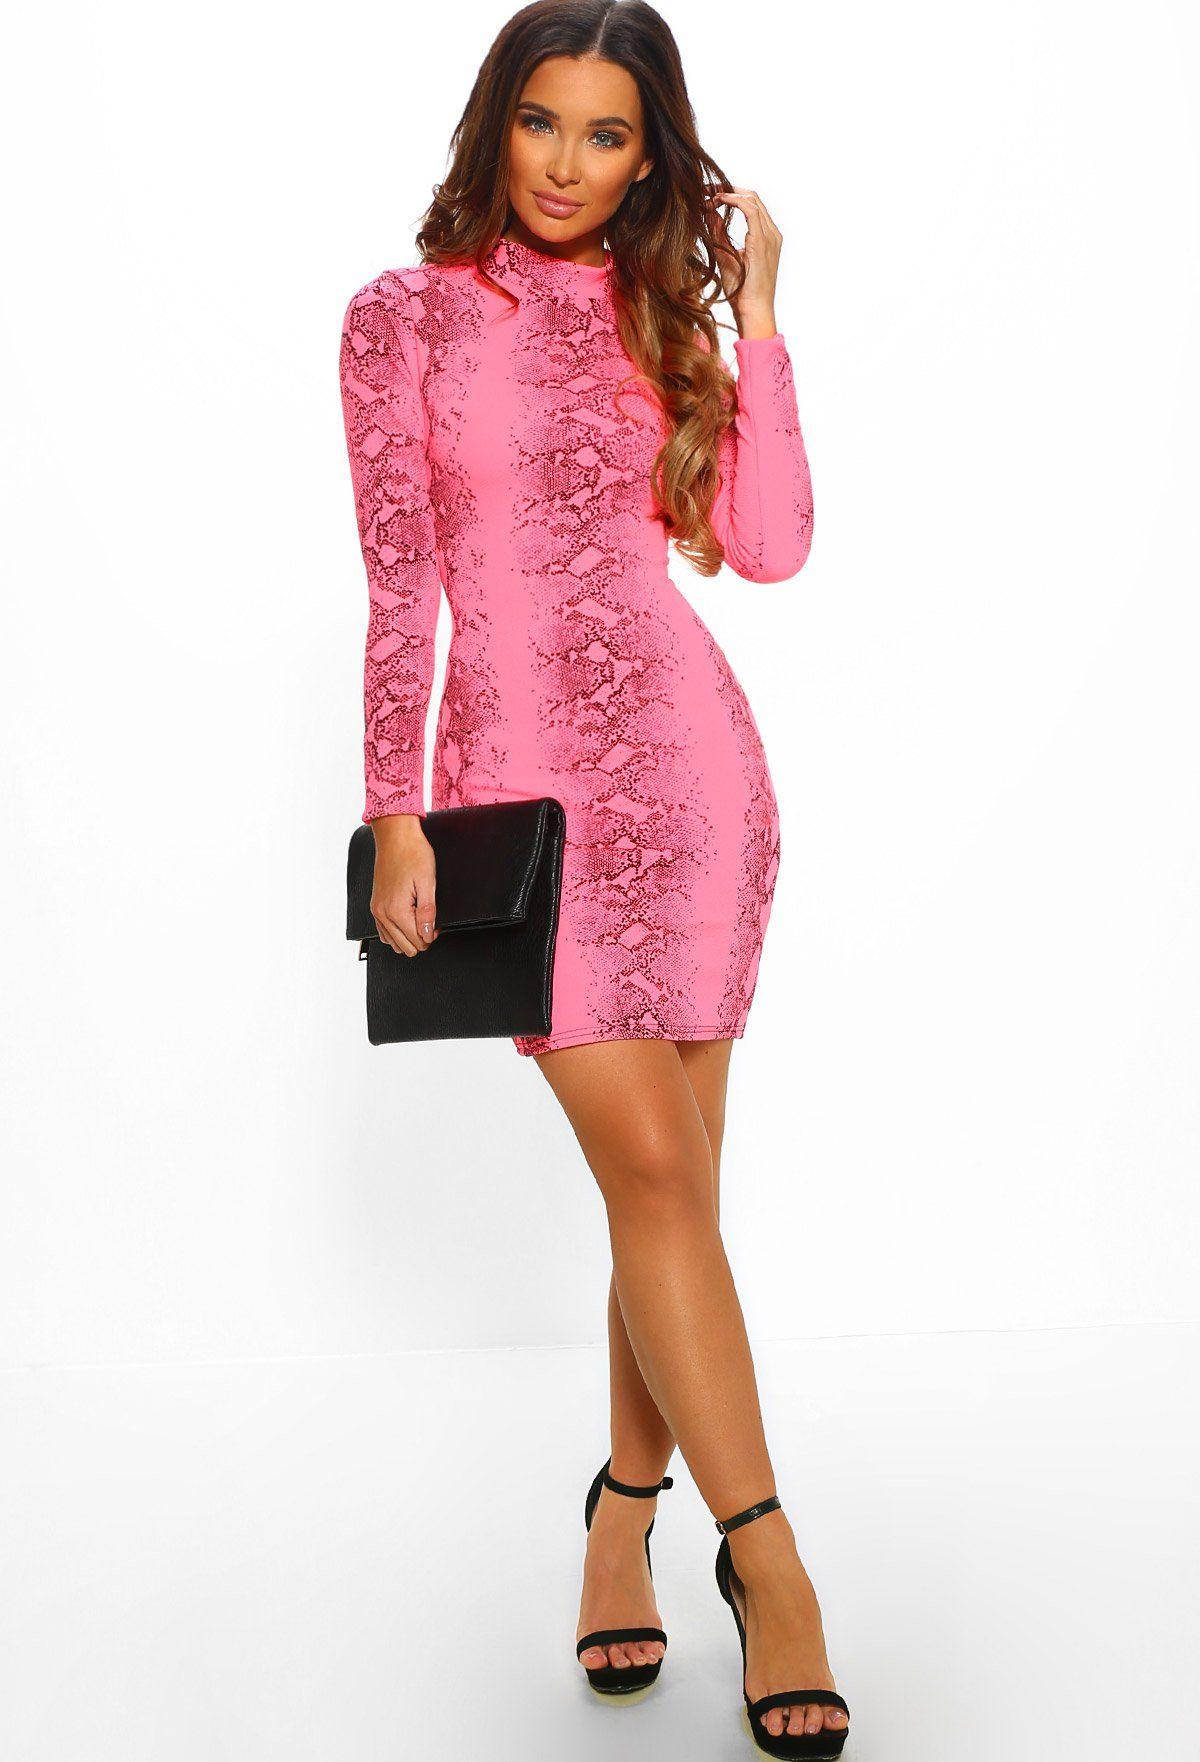 Say No More Neon Pink Snake Print Long Sleeve Mini Dress Mini Dress Long Sleeve Mini Dress Neon Dresses